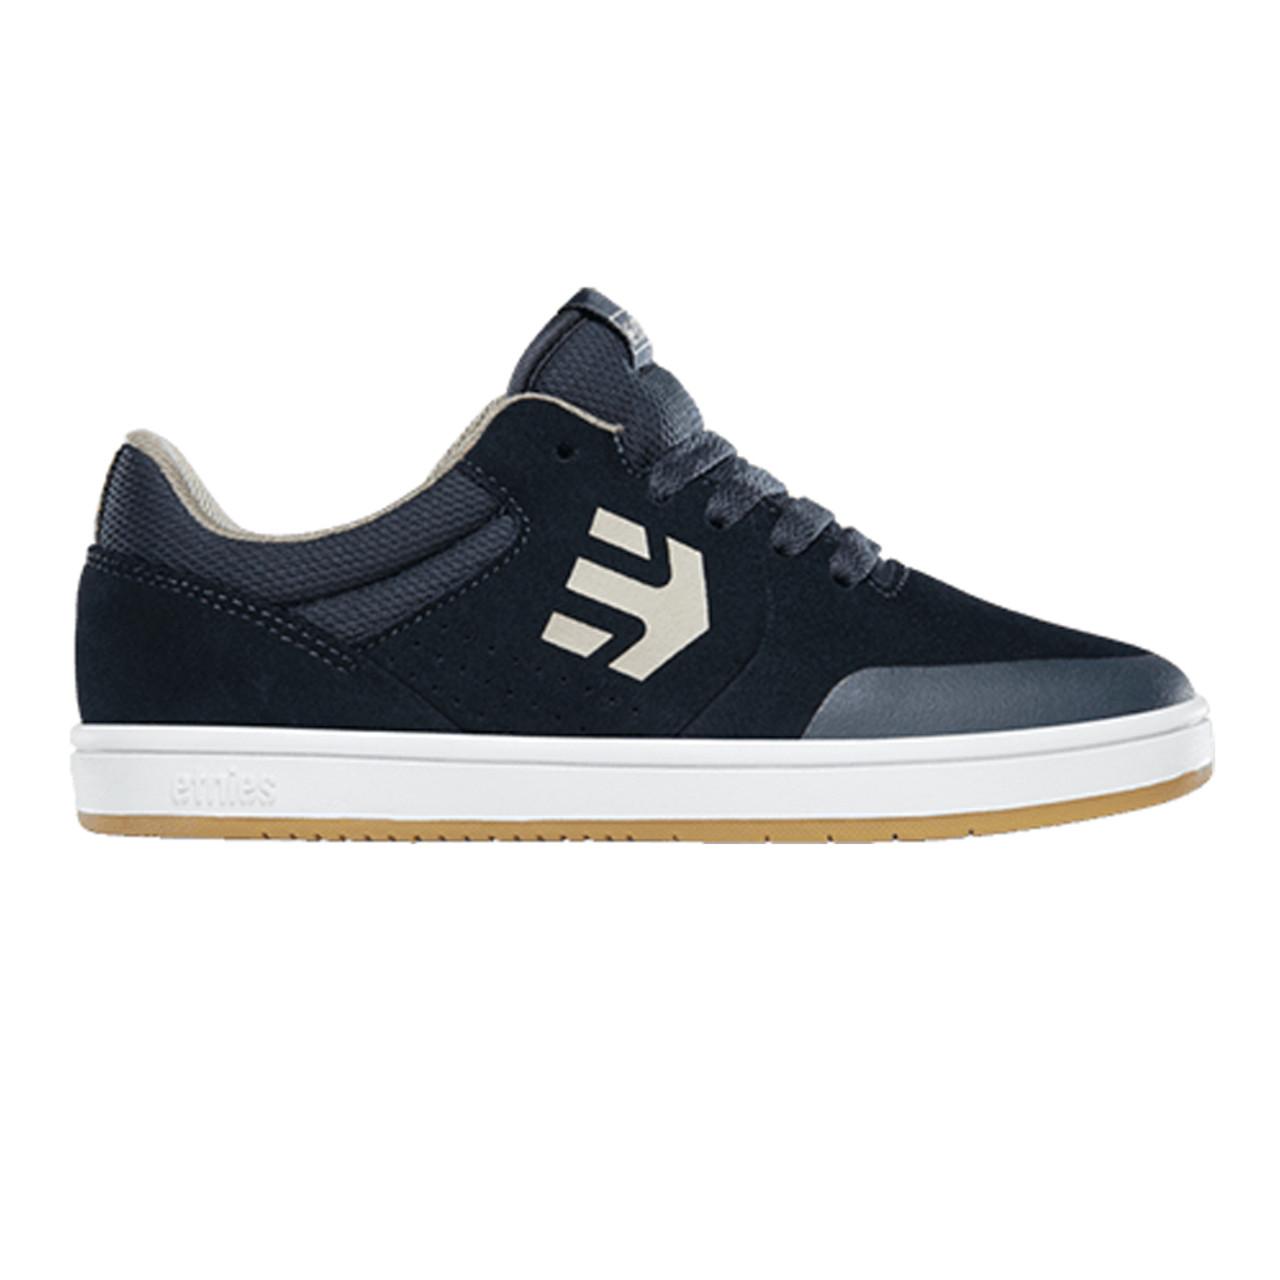 ETNIES Marana Kids Shoes Navy/Tan